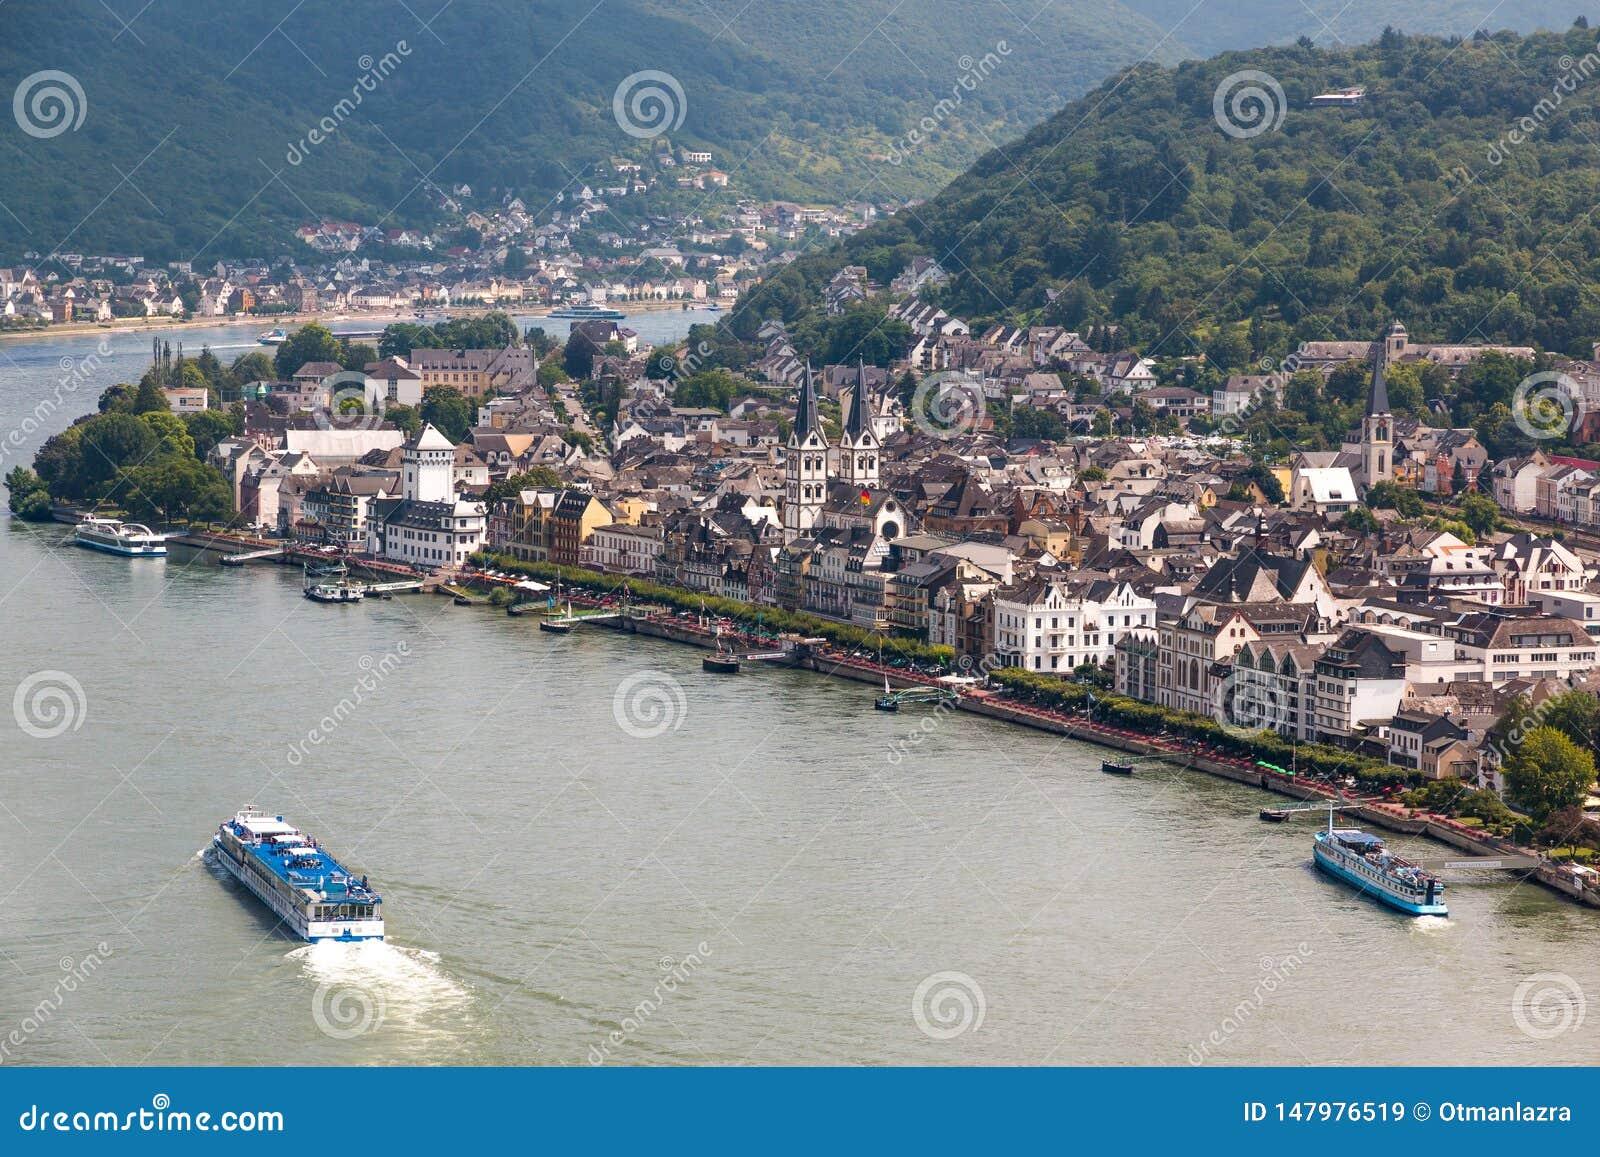 Wine Village of Boppard at Rhine